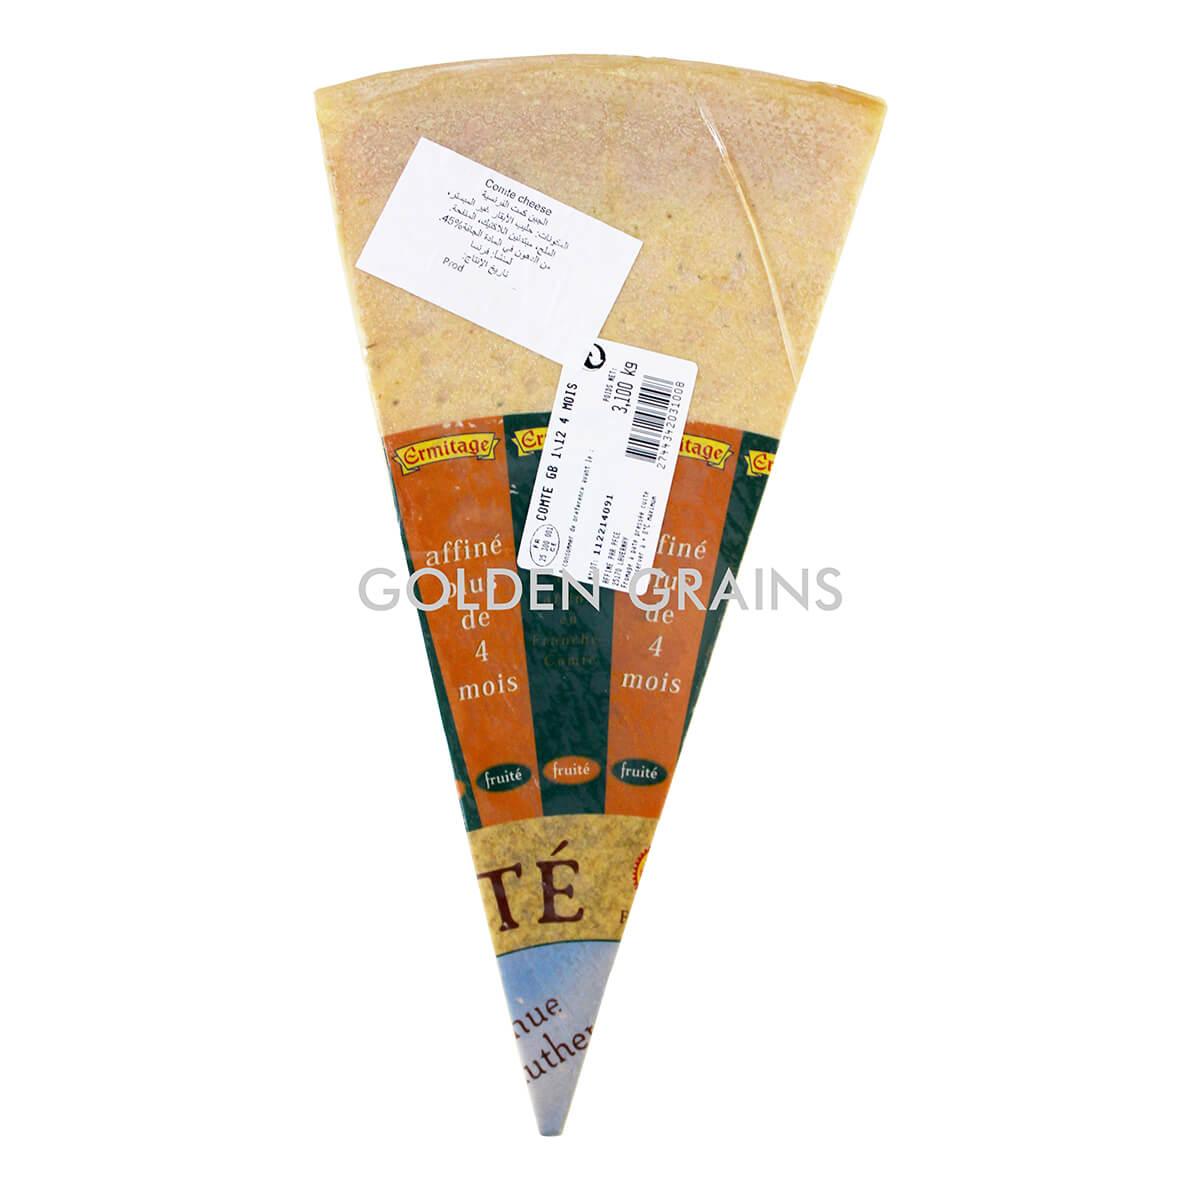 Golden Grains Dubai Export - Comte - Top.jpg